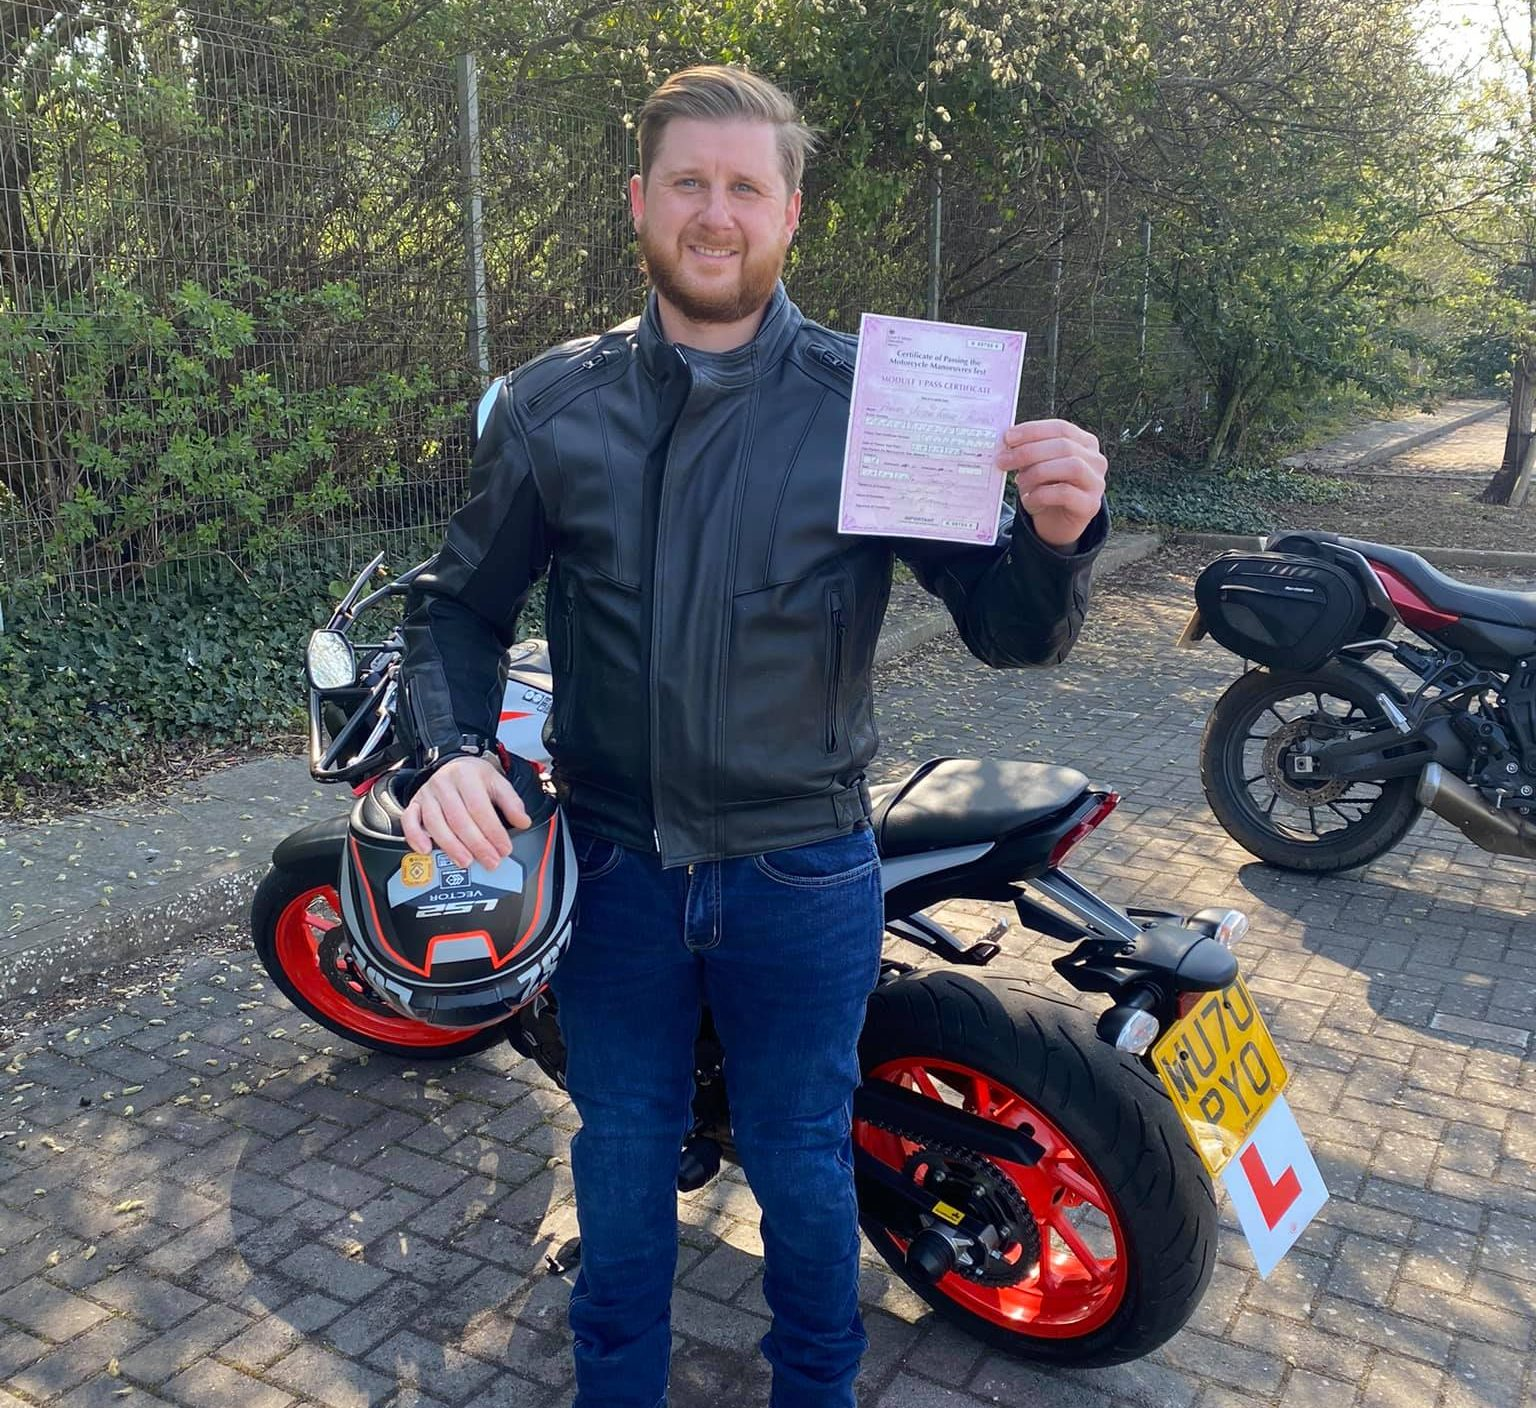 motorbike test passed bridgwater